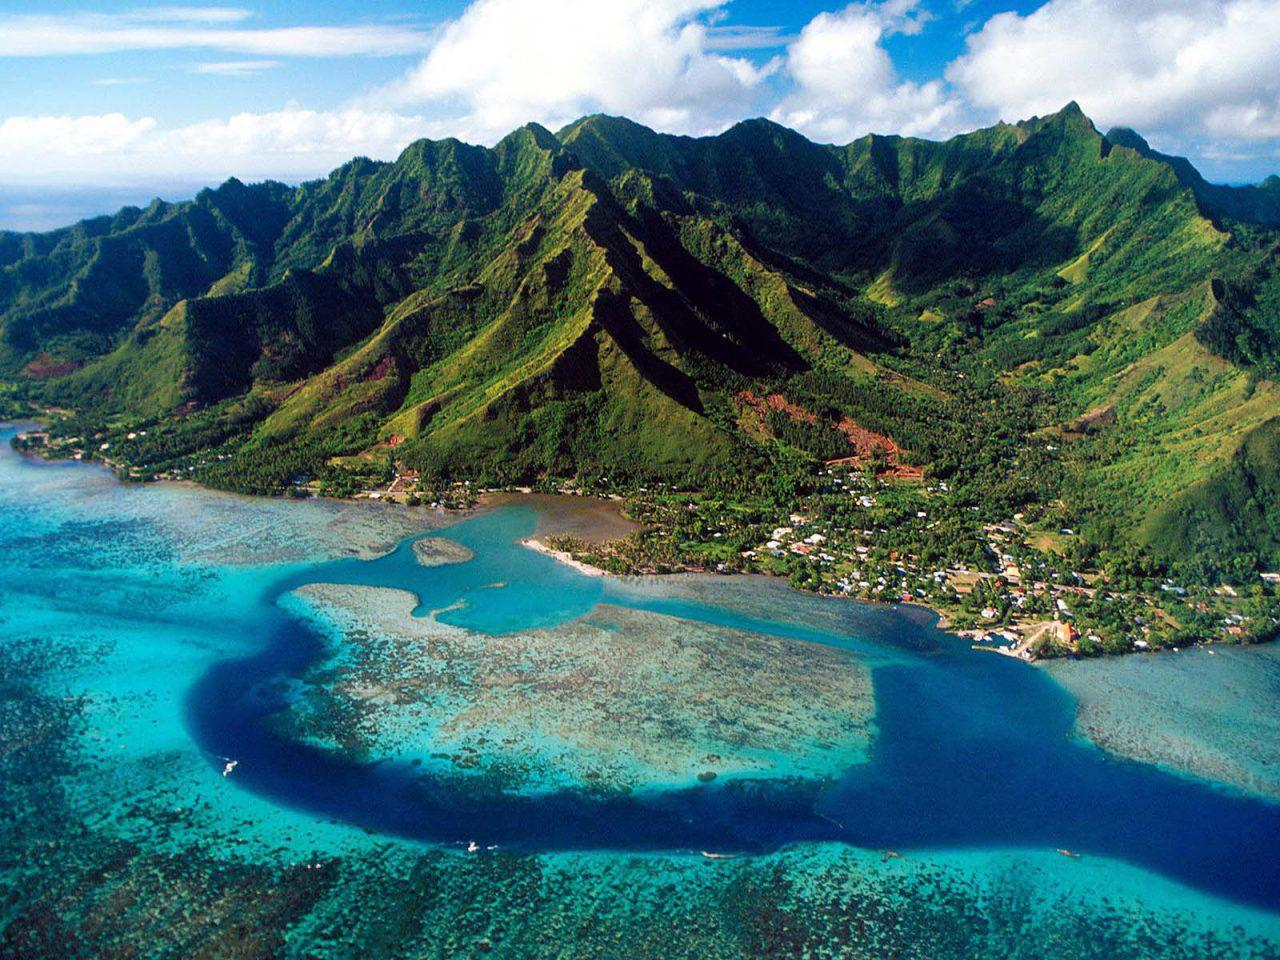 jamaica Μέρη που αξίζει να επισκεφτείς μέσα στο 2017 (μέρος β')